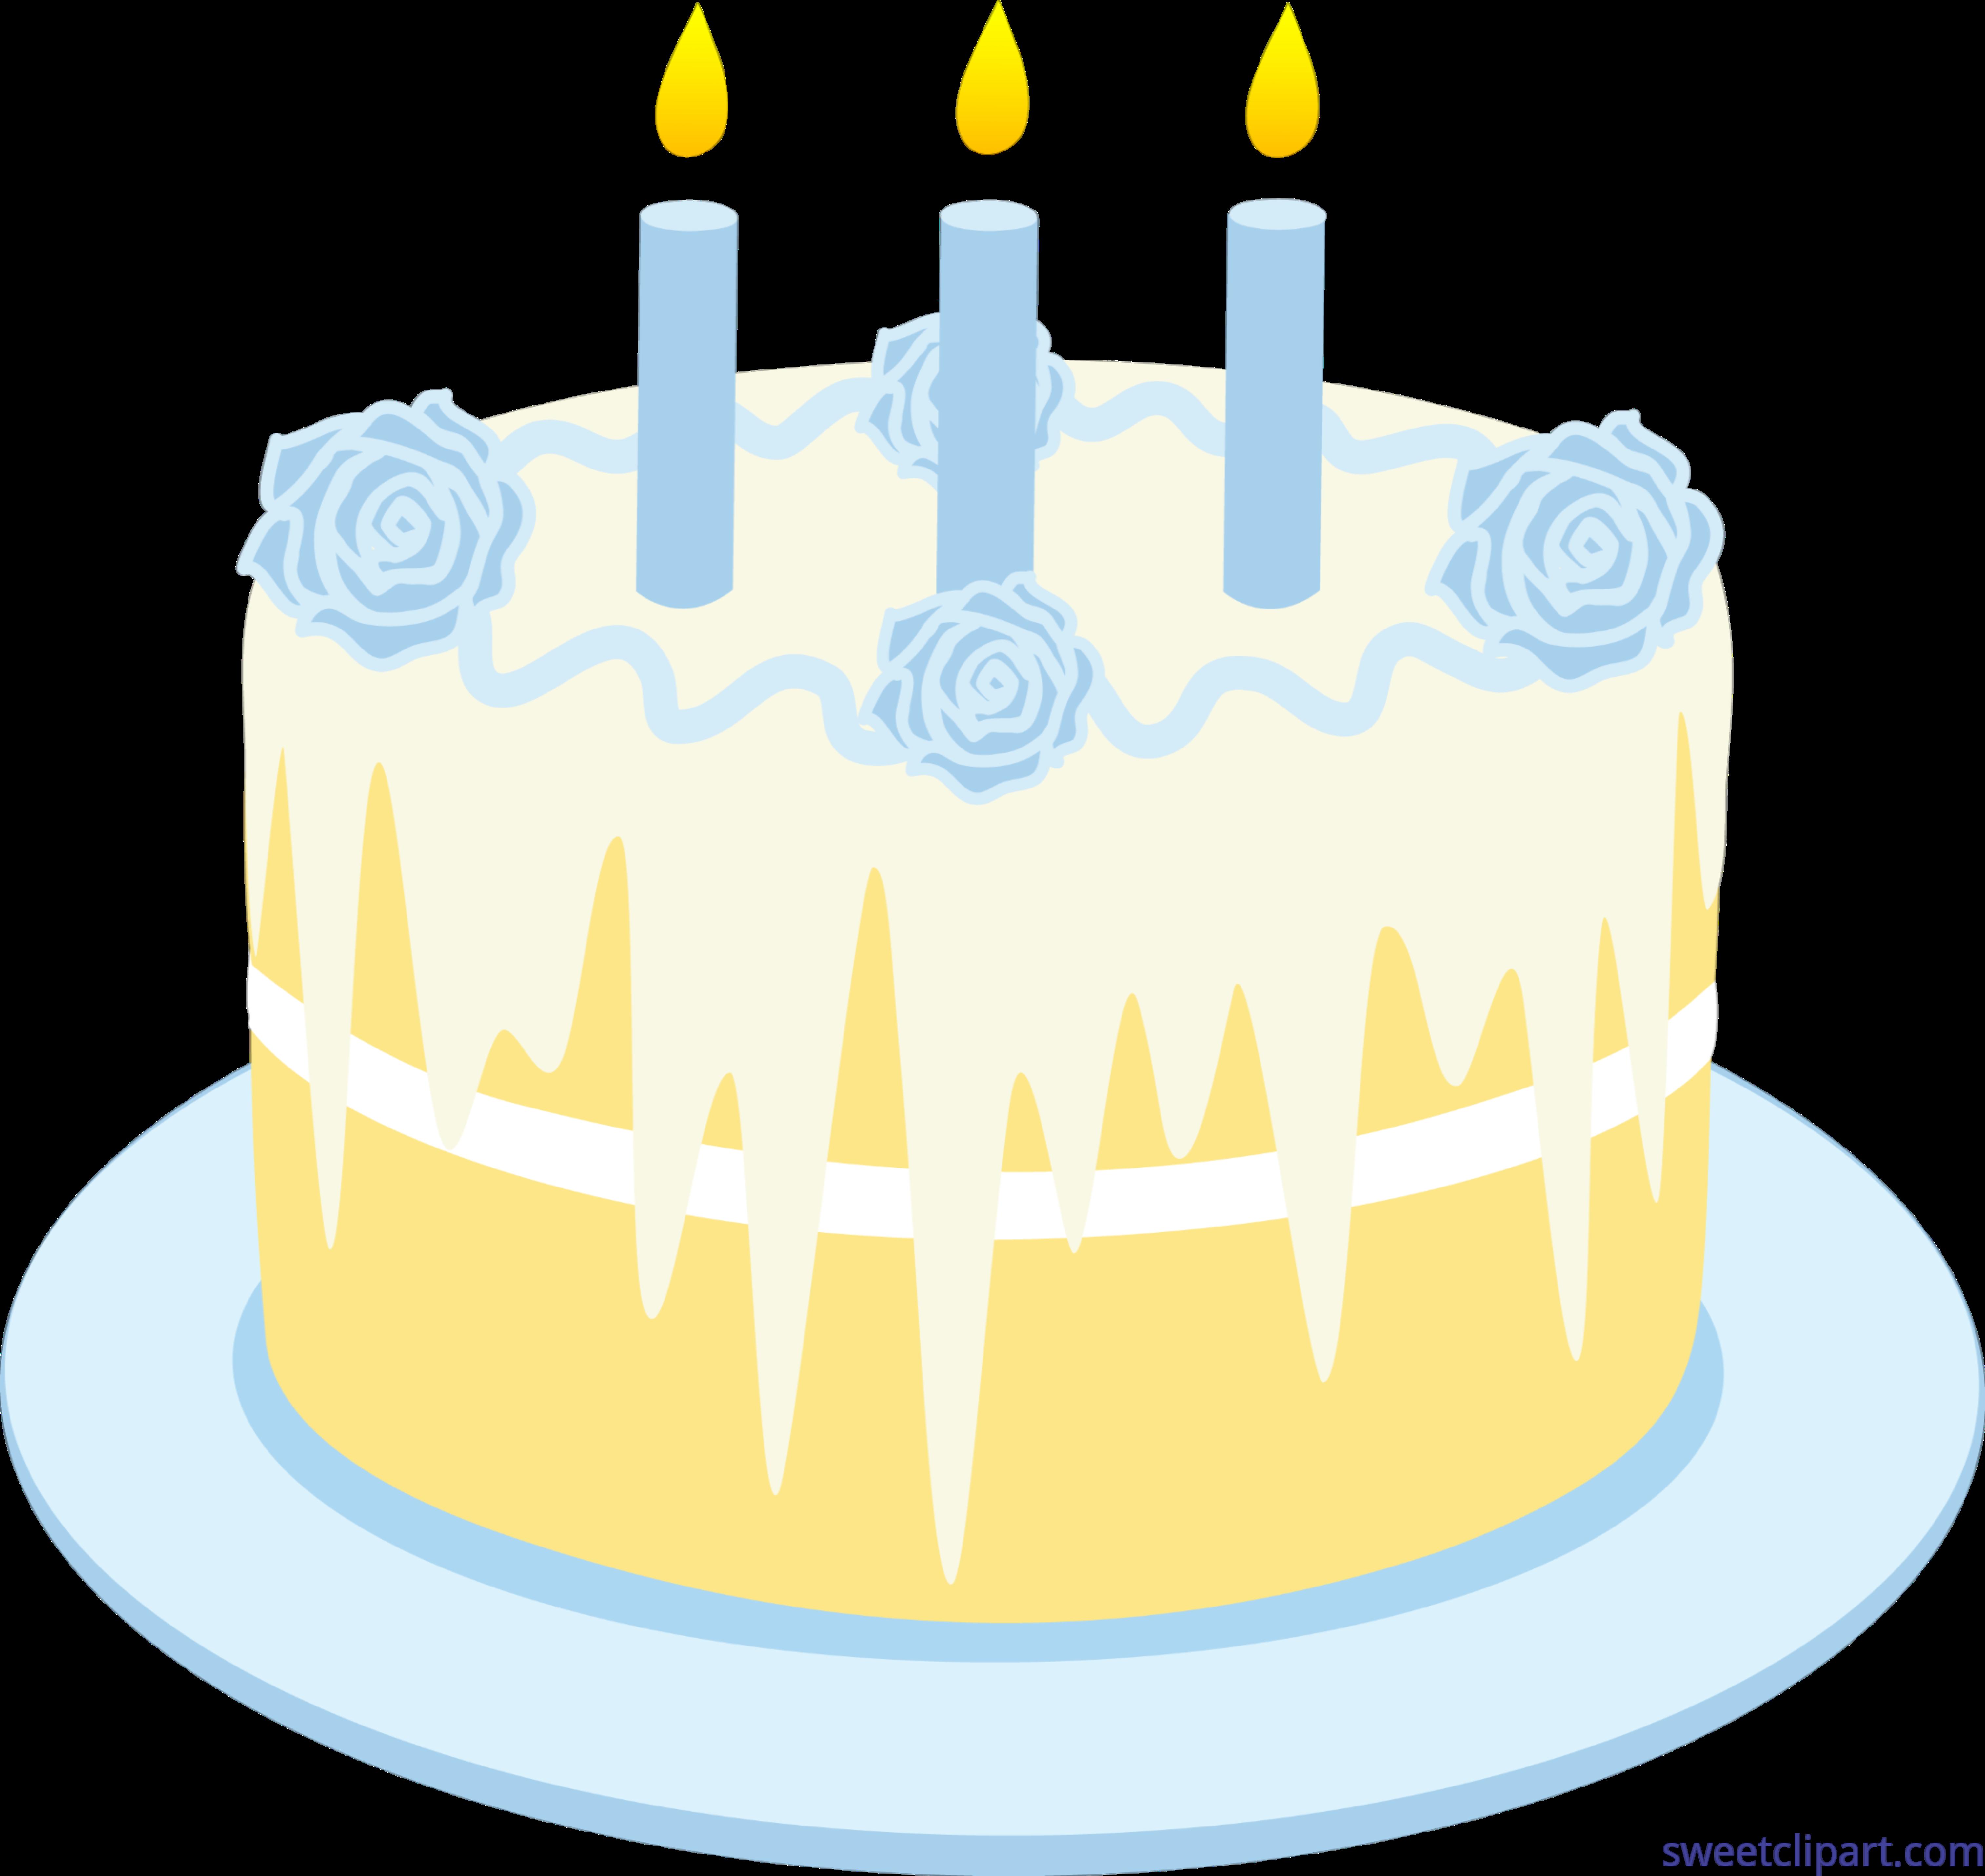 Food Holidays Birthday Cake 2 With Candles Vanilla Clip Art.